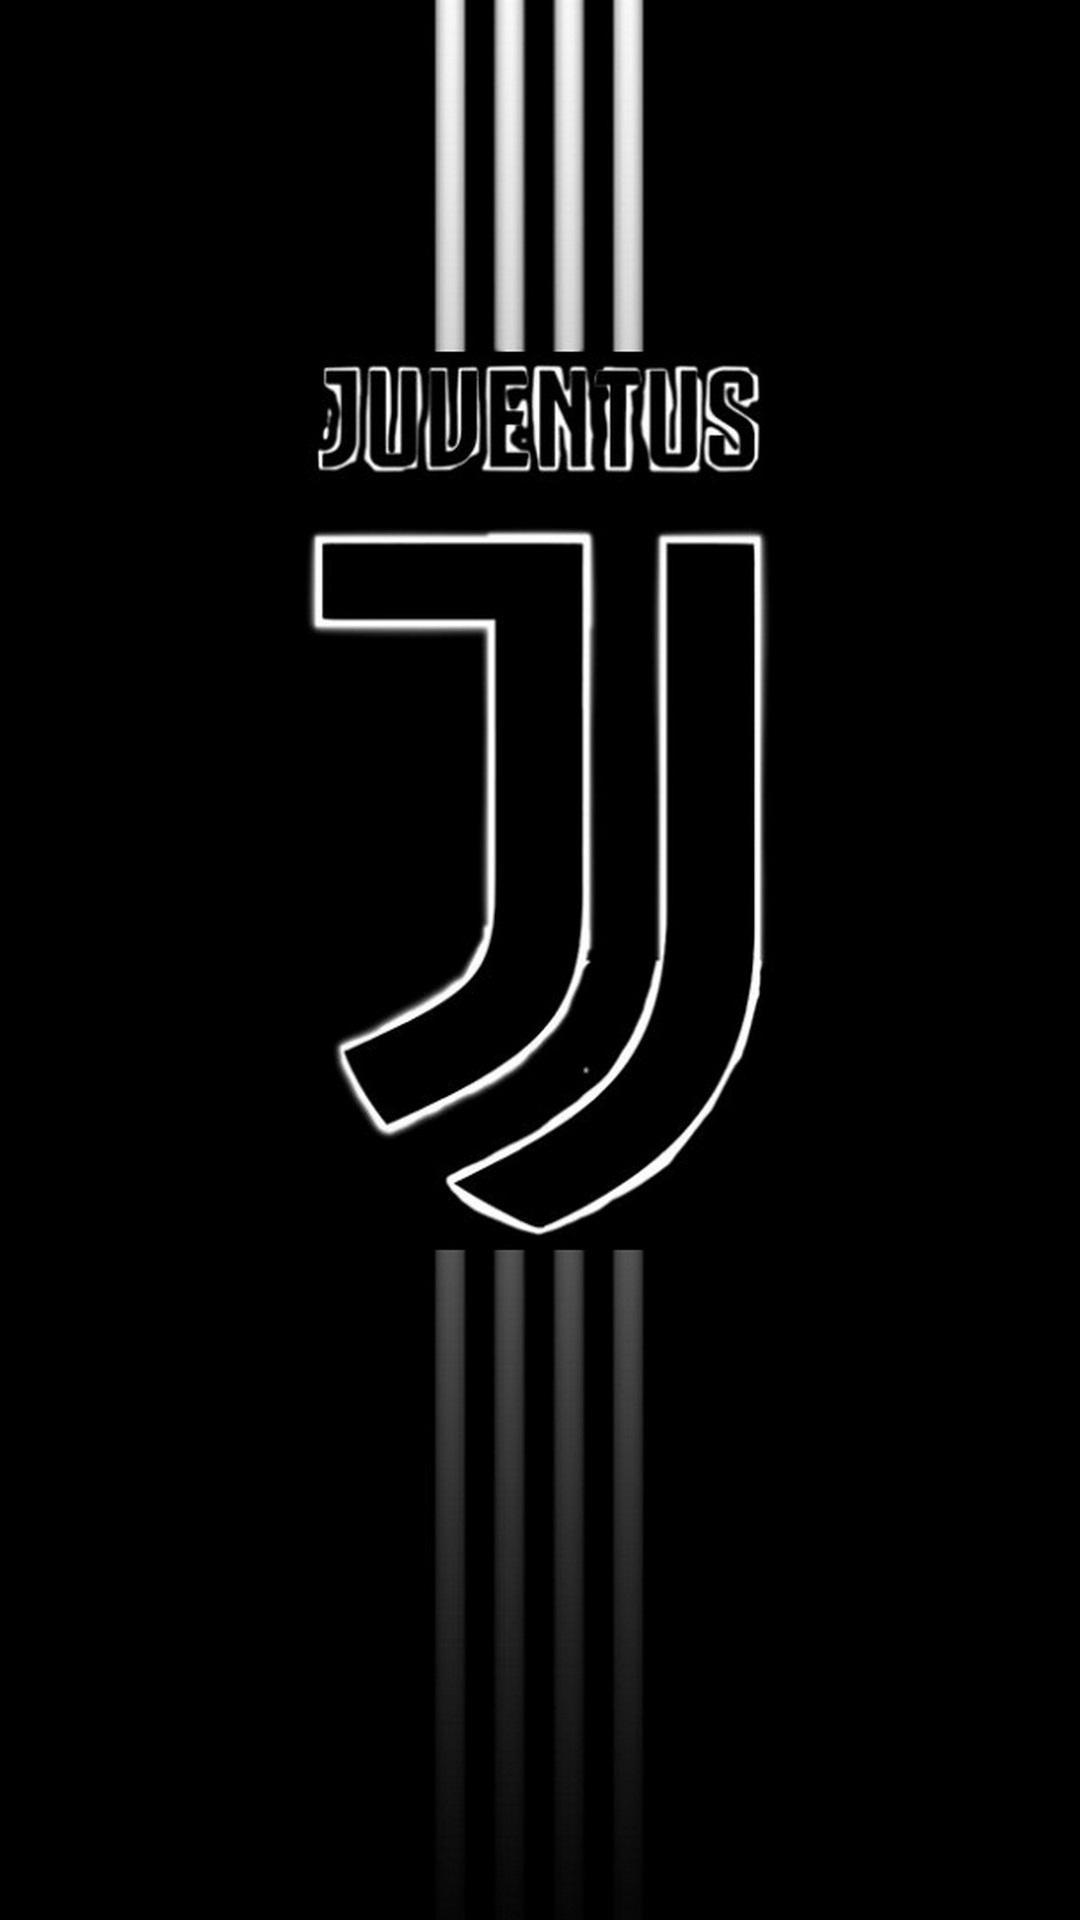 Juventus Iphone 7 Wallpapers Wallpaper Cave